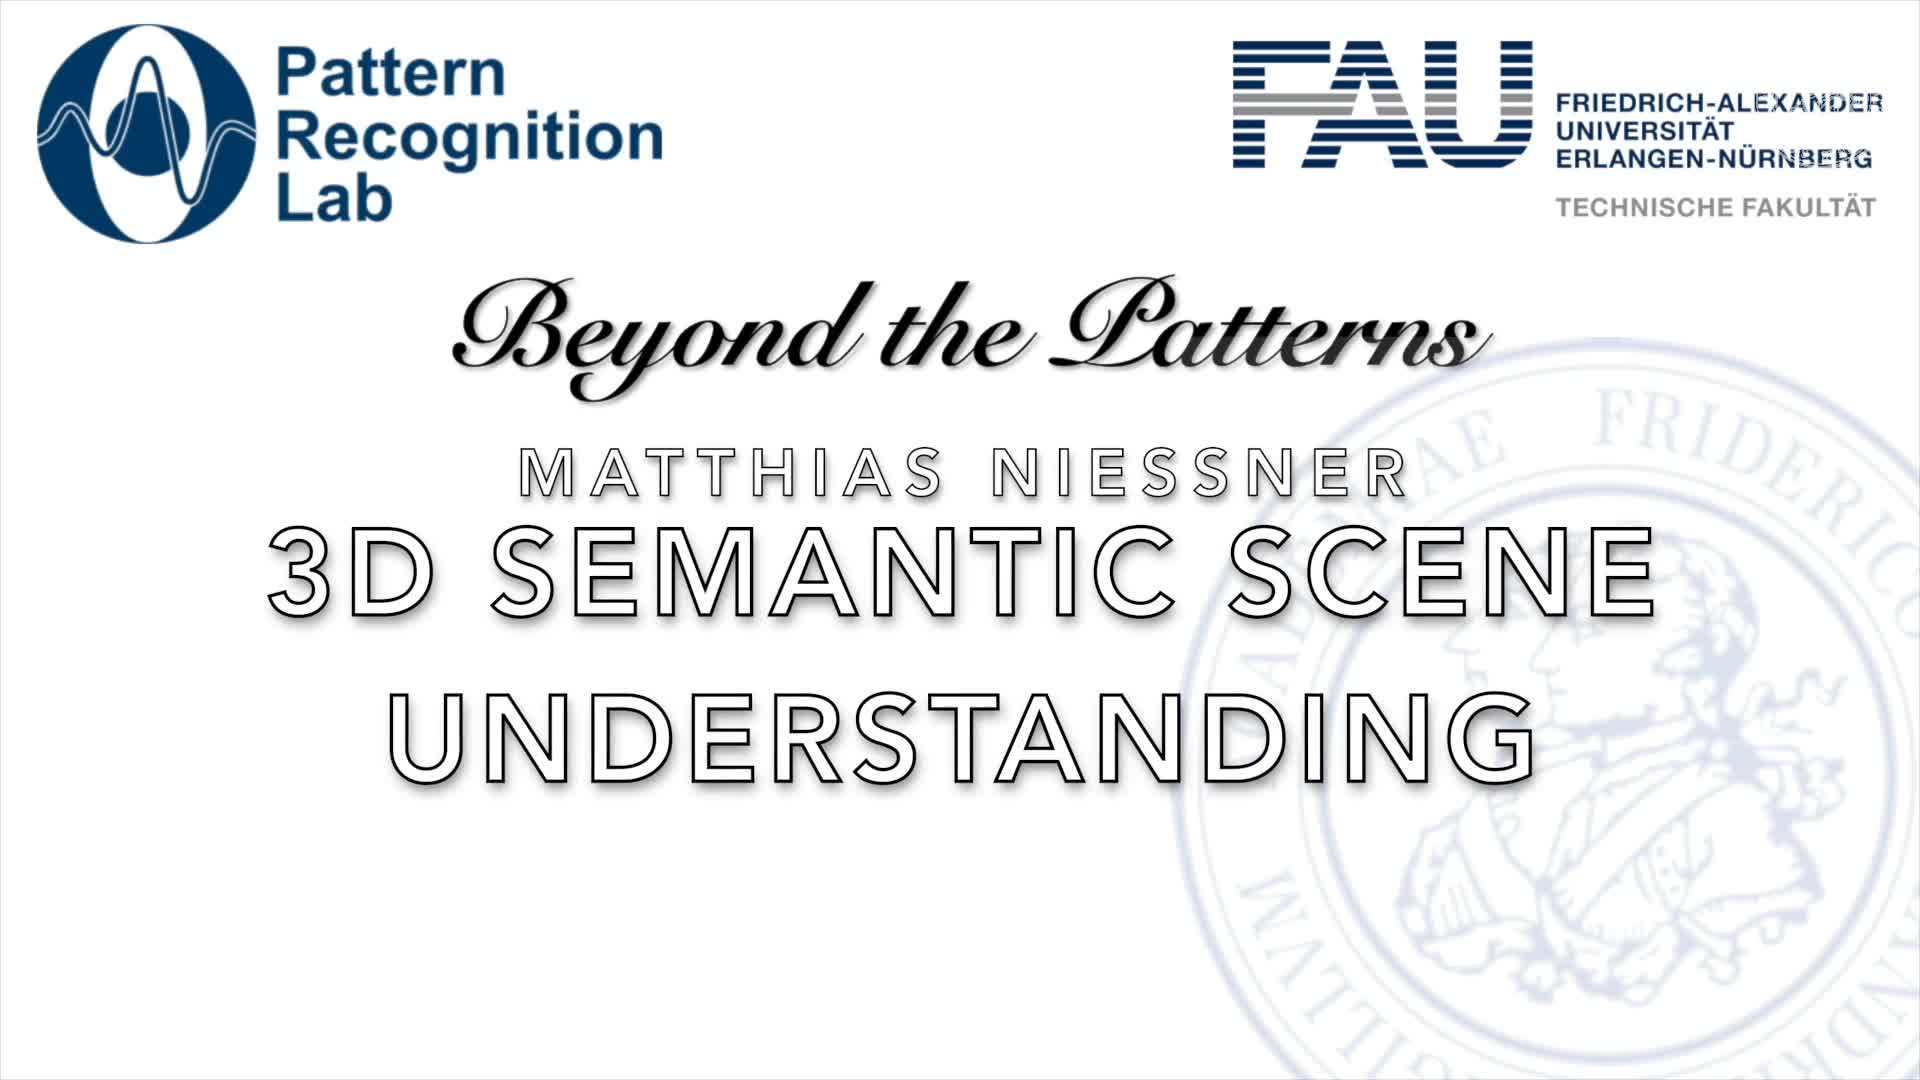 Beyond the Patterns - Matthias Niessner - 3D Semantic Scene Understanding preview image